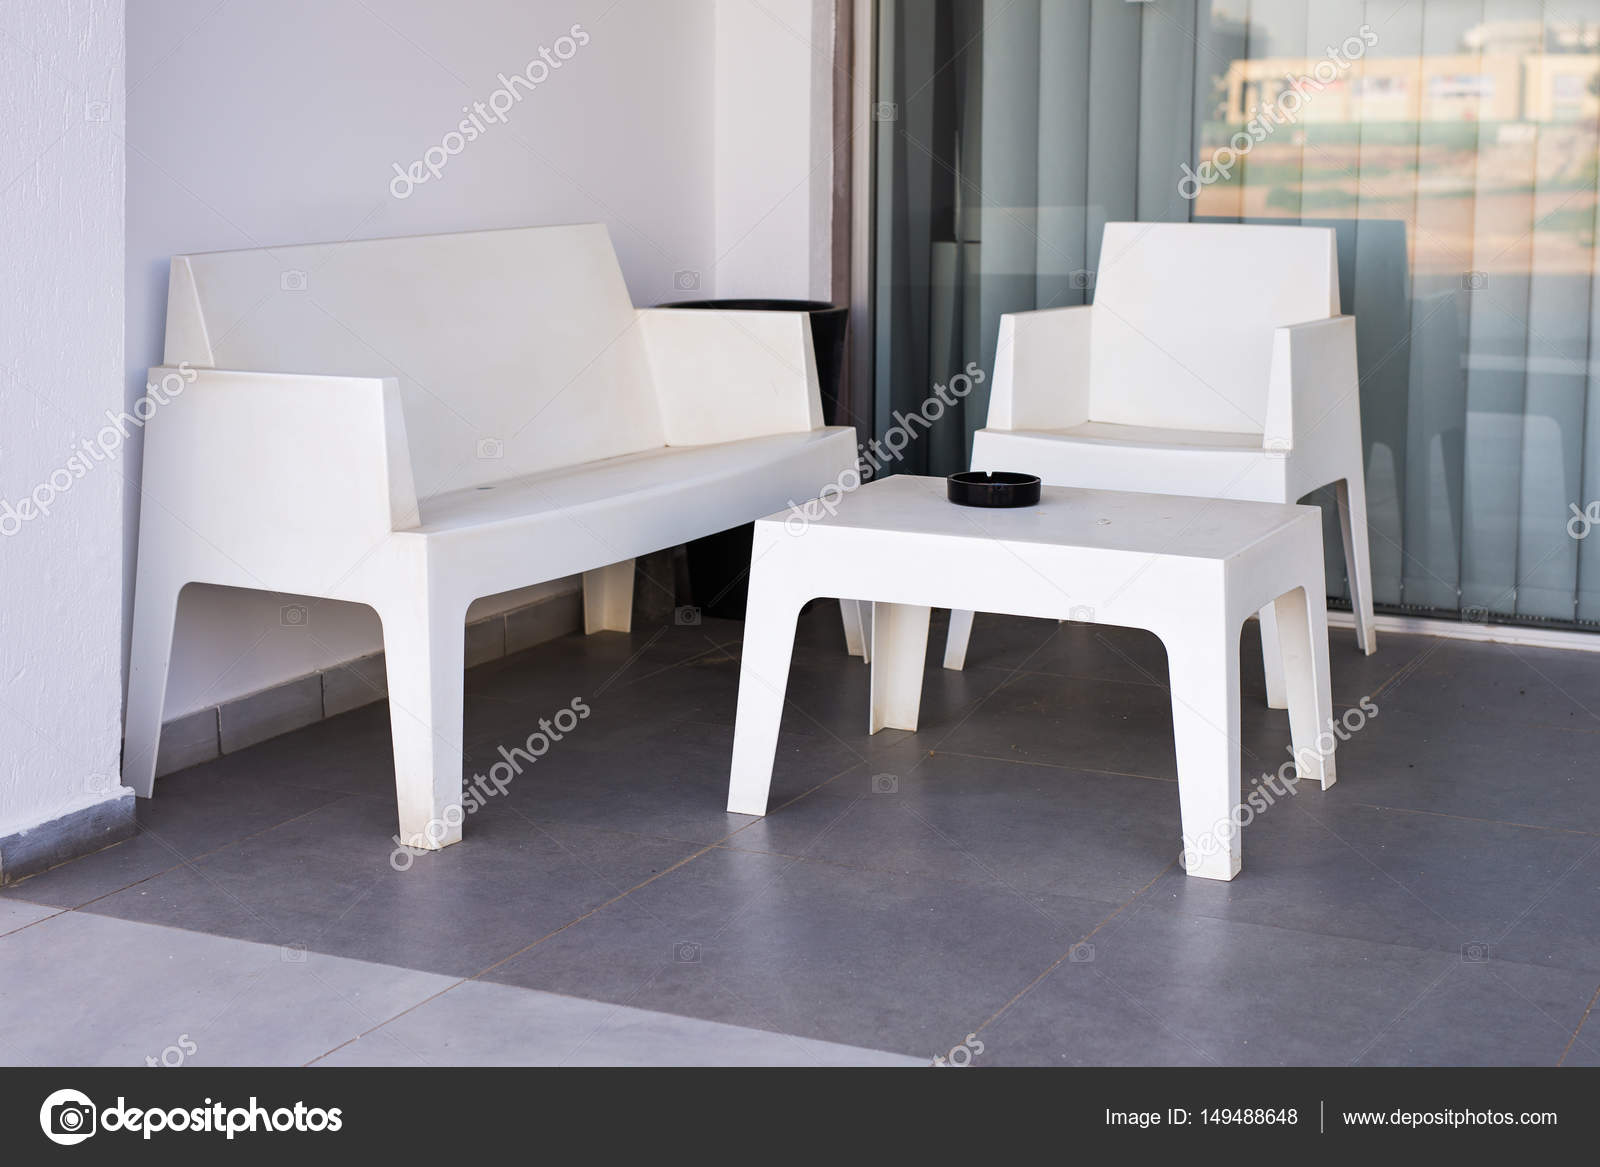 Witte moderne stoelen en tafel buiten stockfoto satura for Buiten stoelen